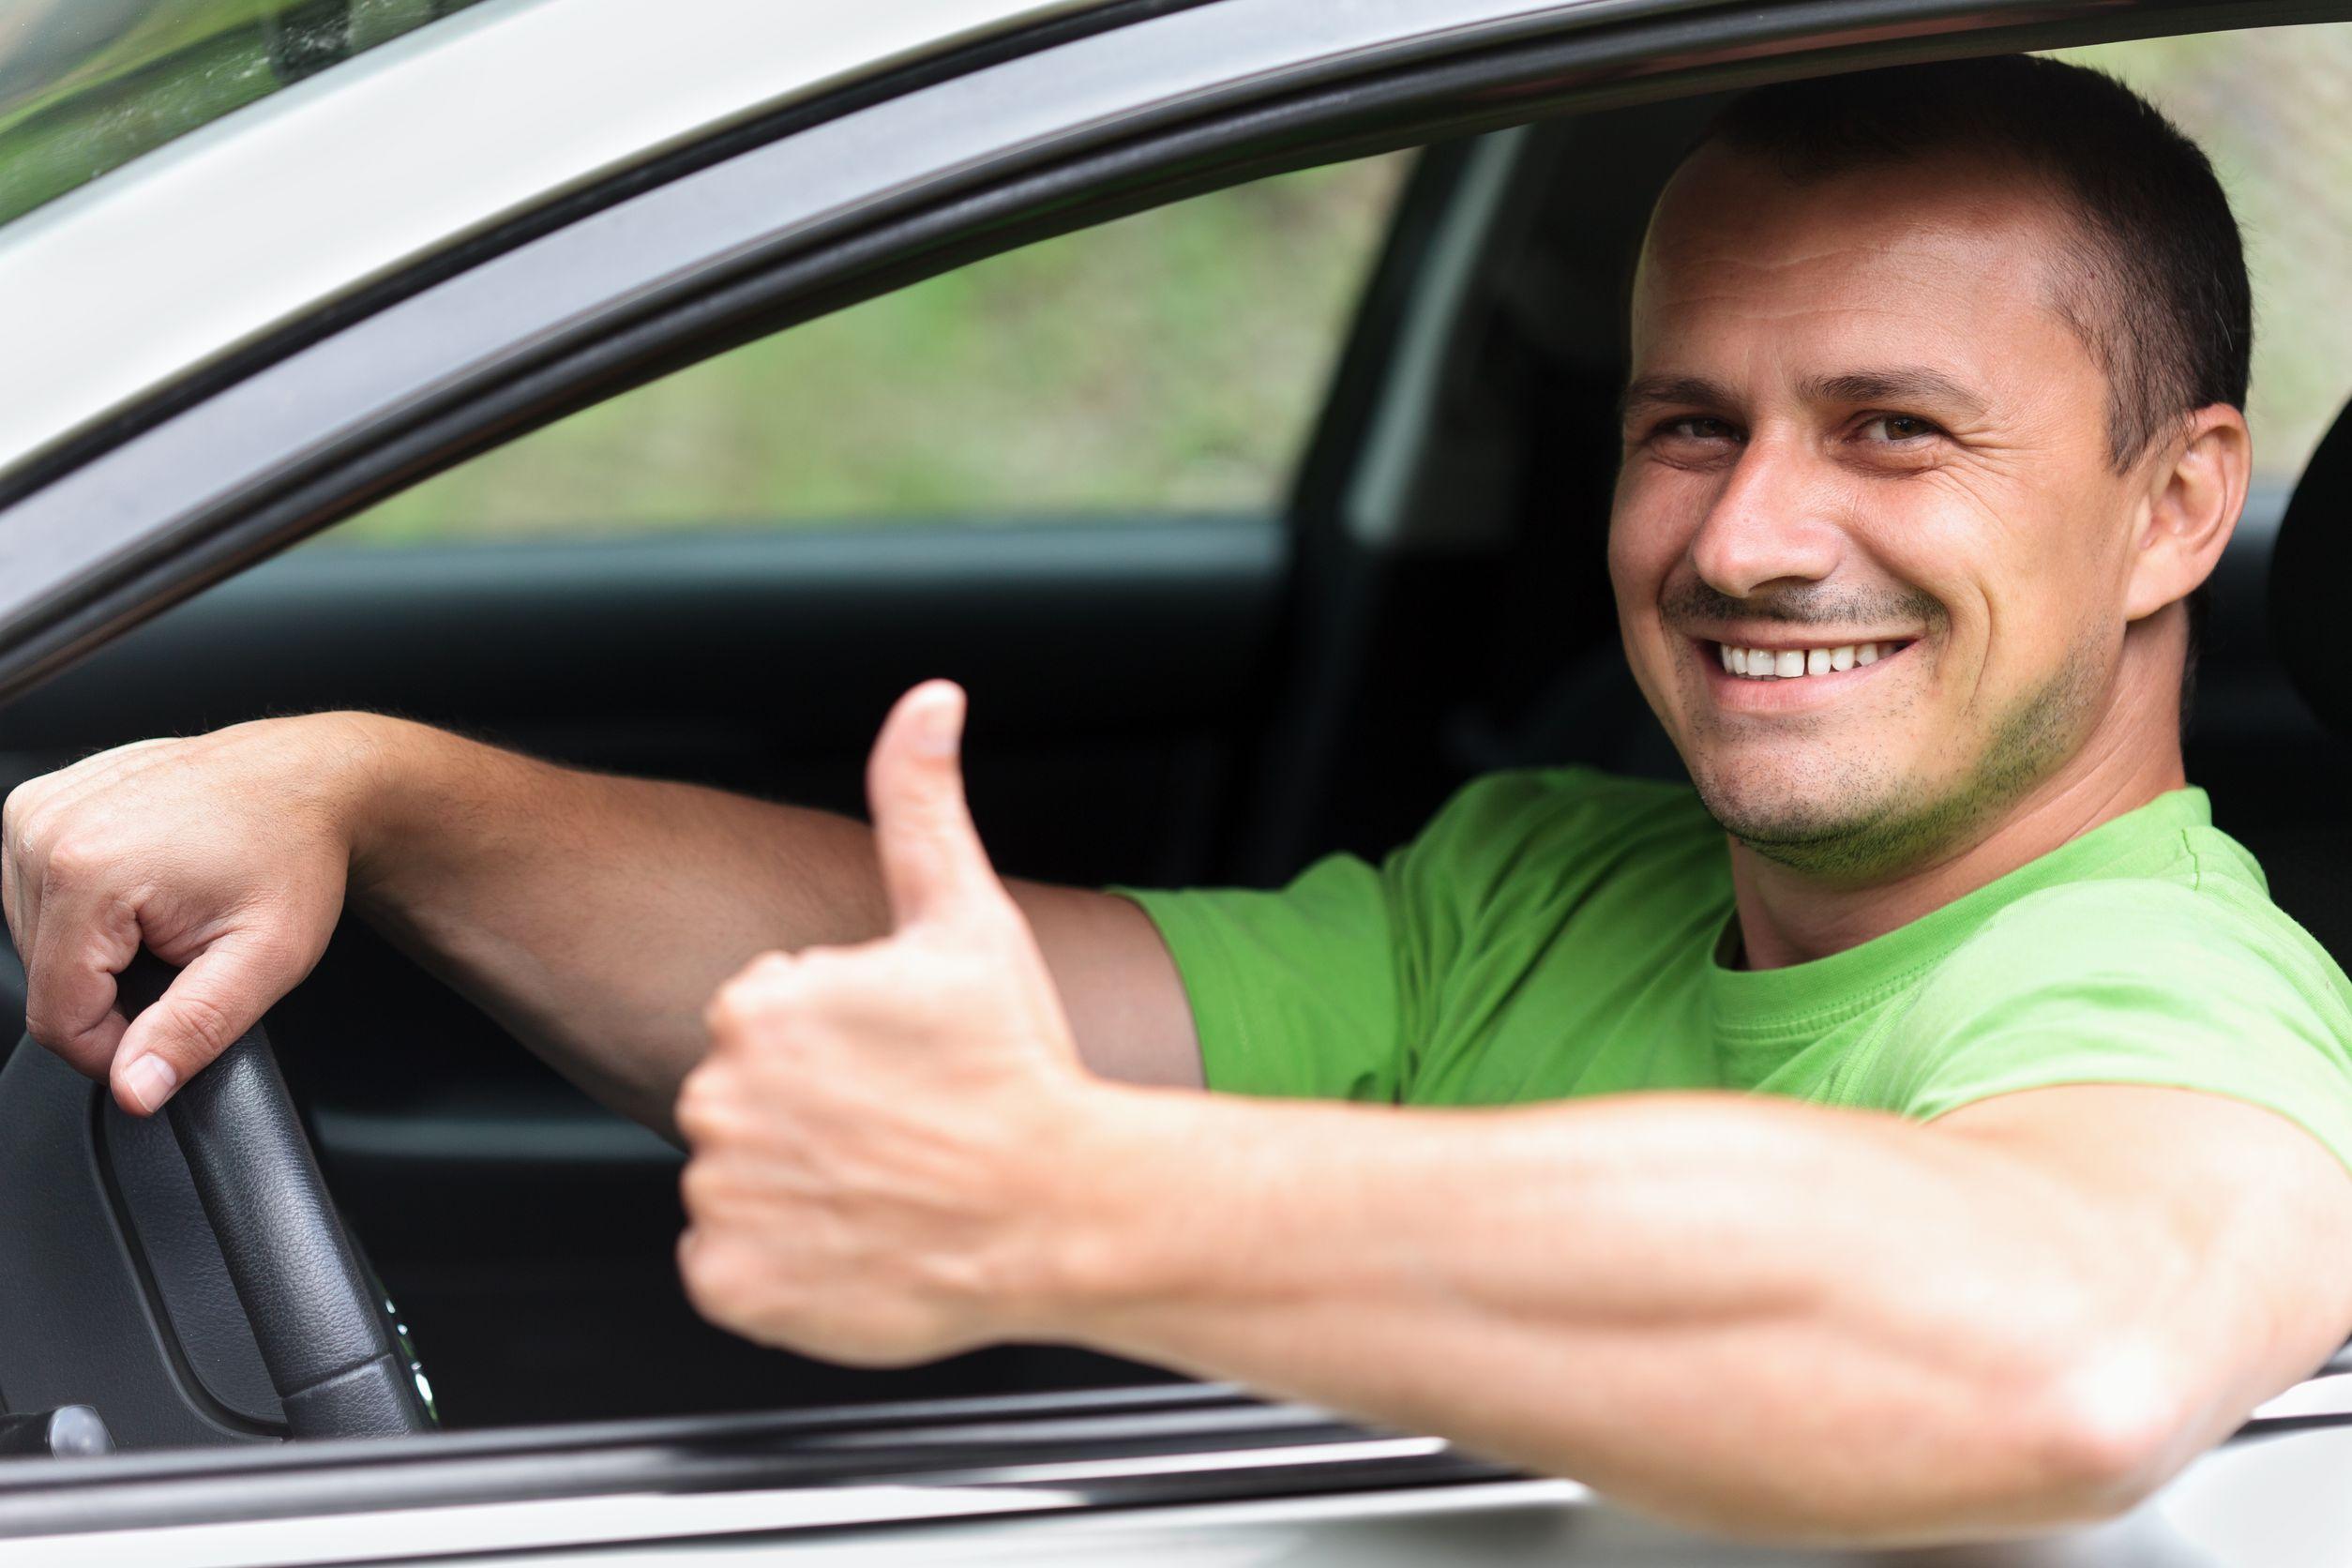 водитель фото или картинки скуки